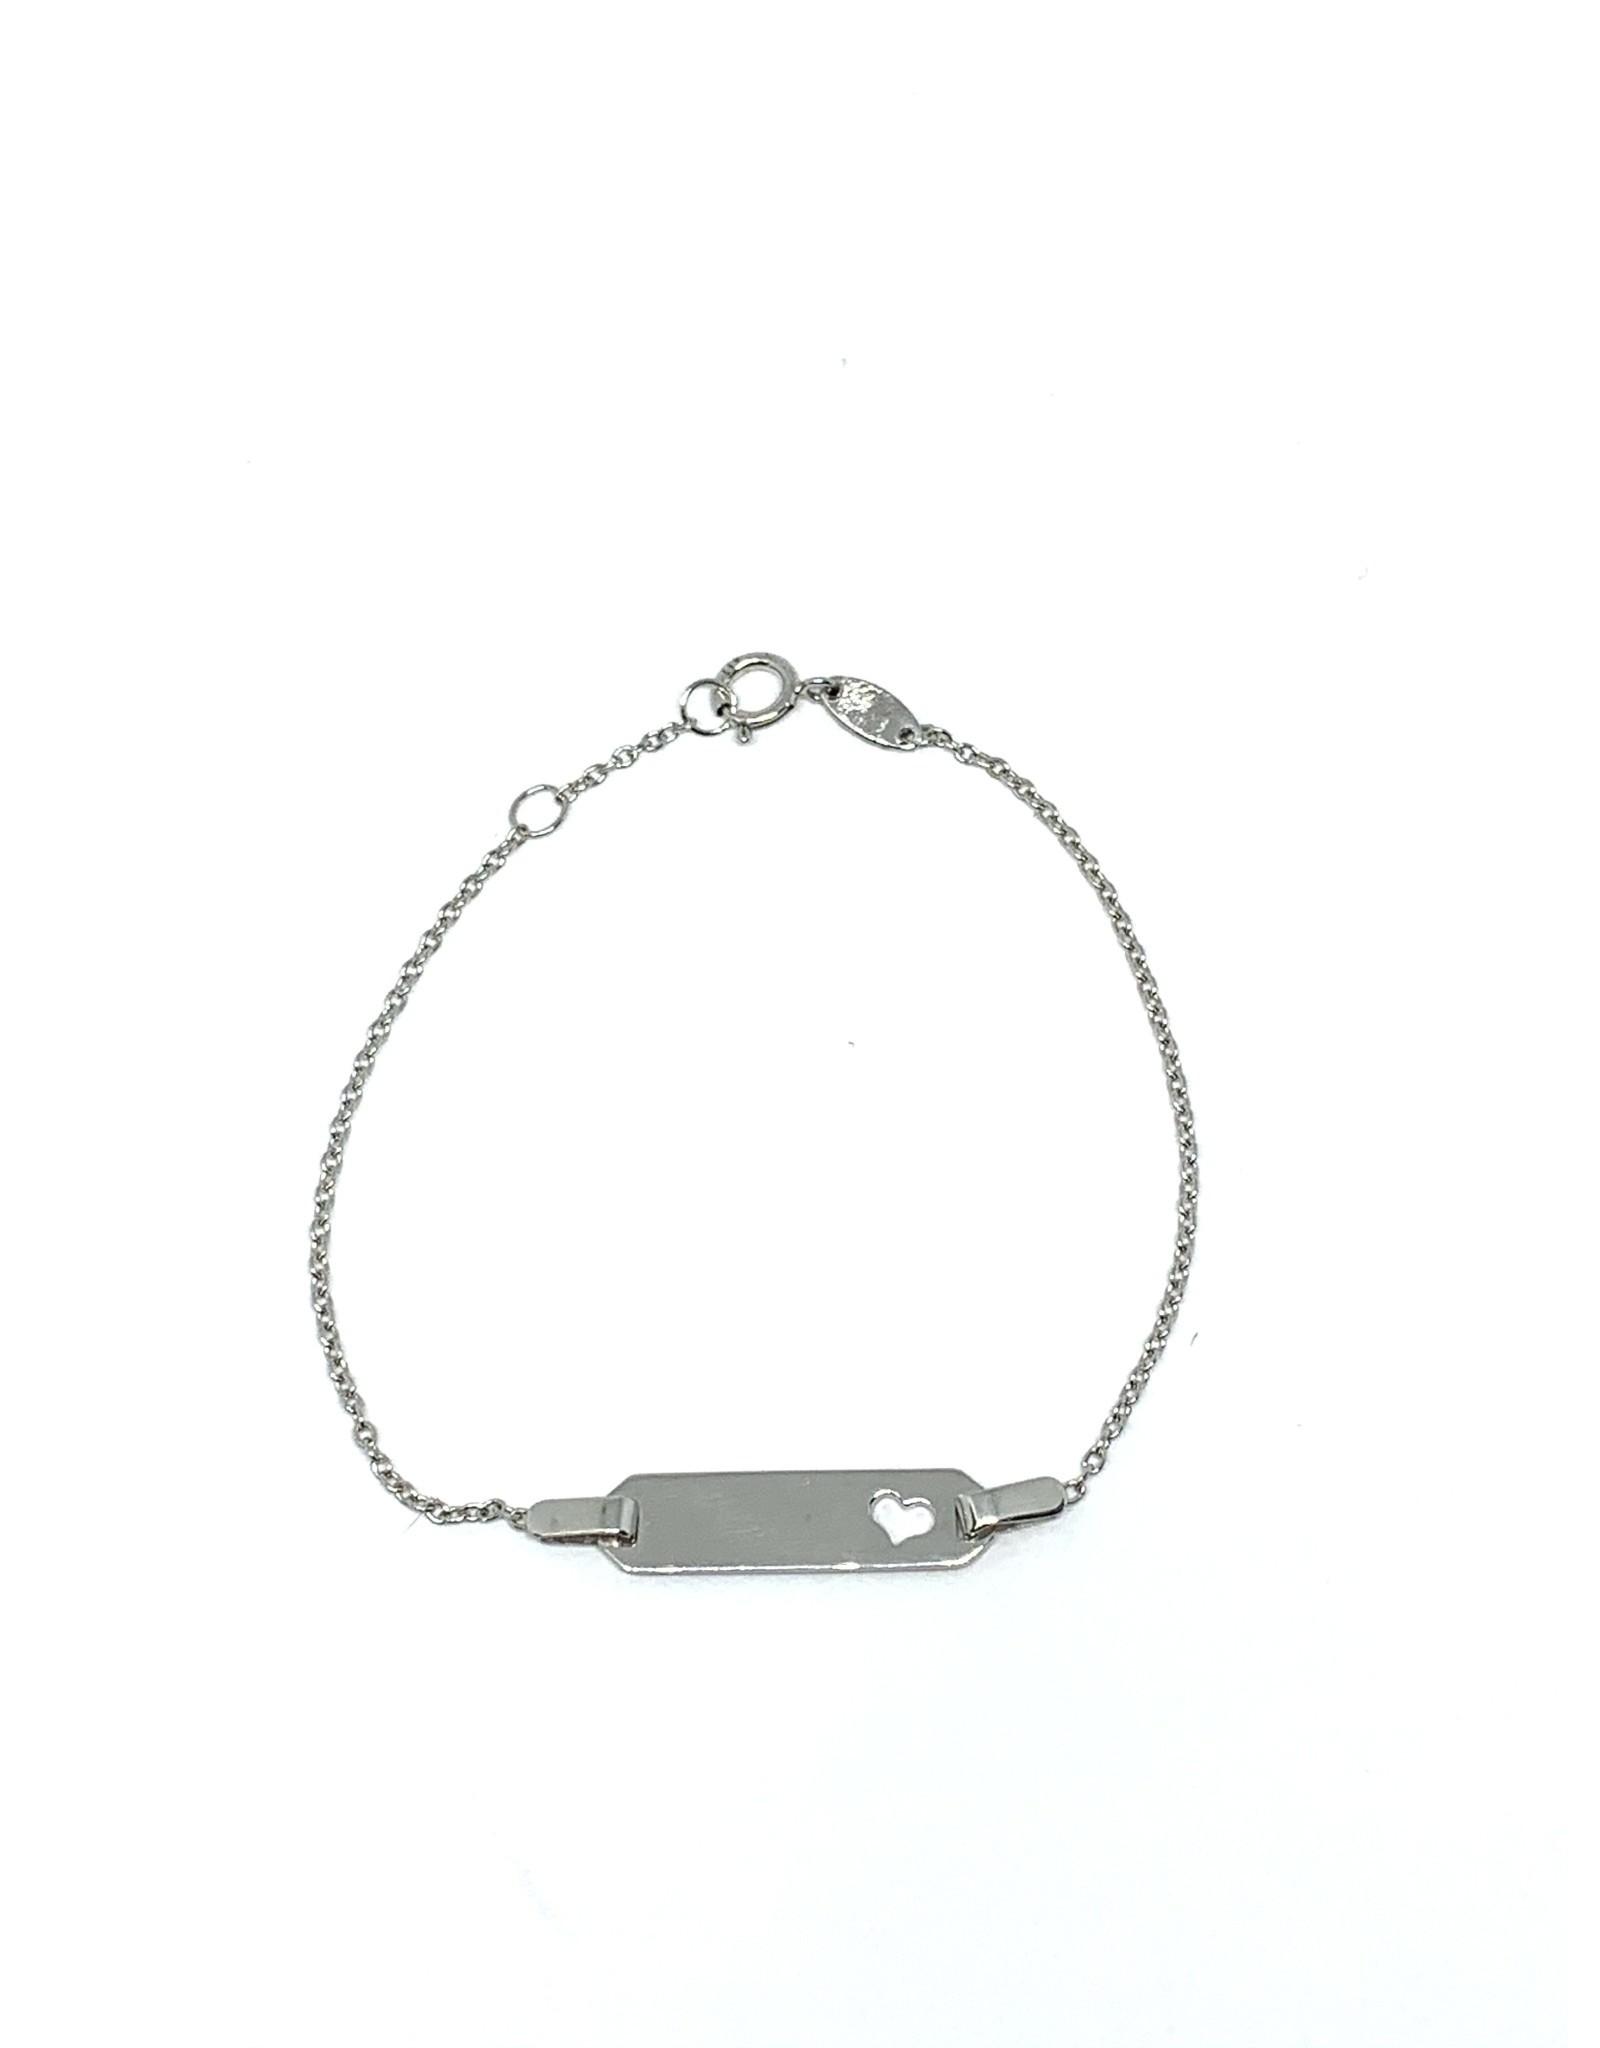 Bracelet pour Enfant en Or blanc 10K